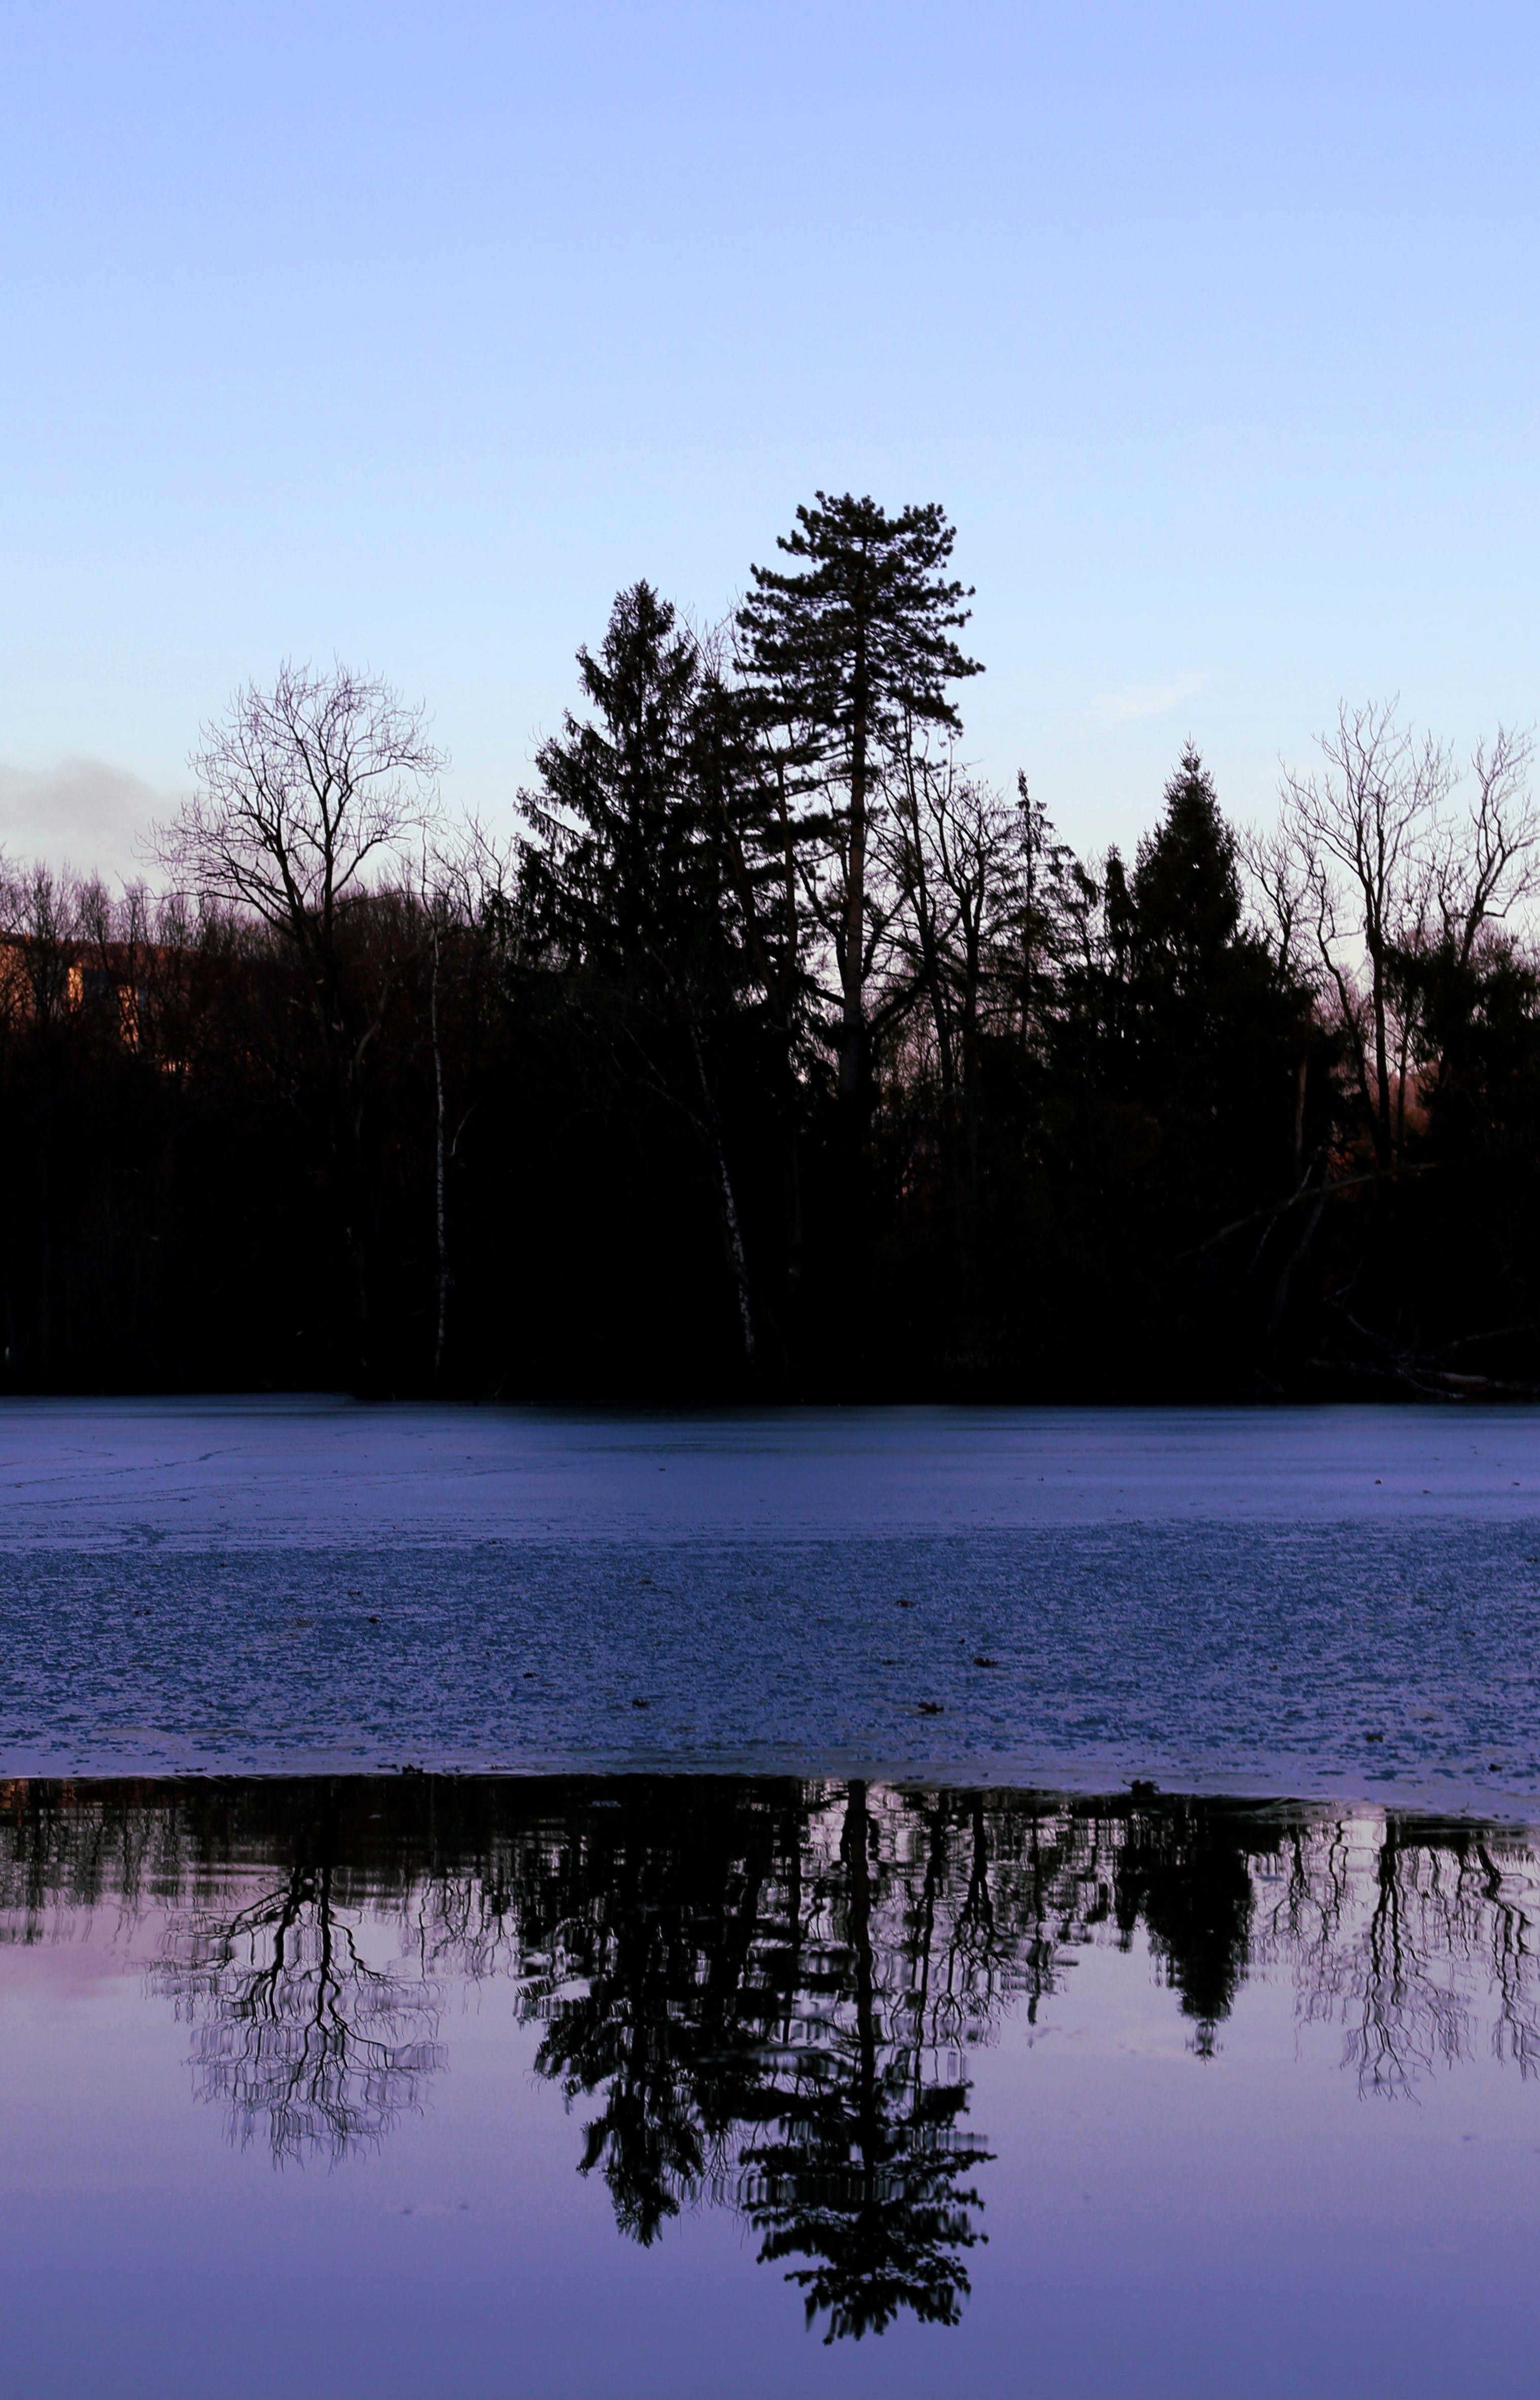 Free stock photo of blue sky, clear sky, evening, evening sun